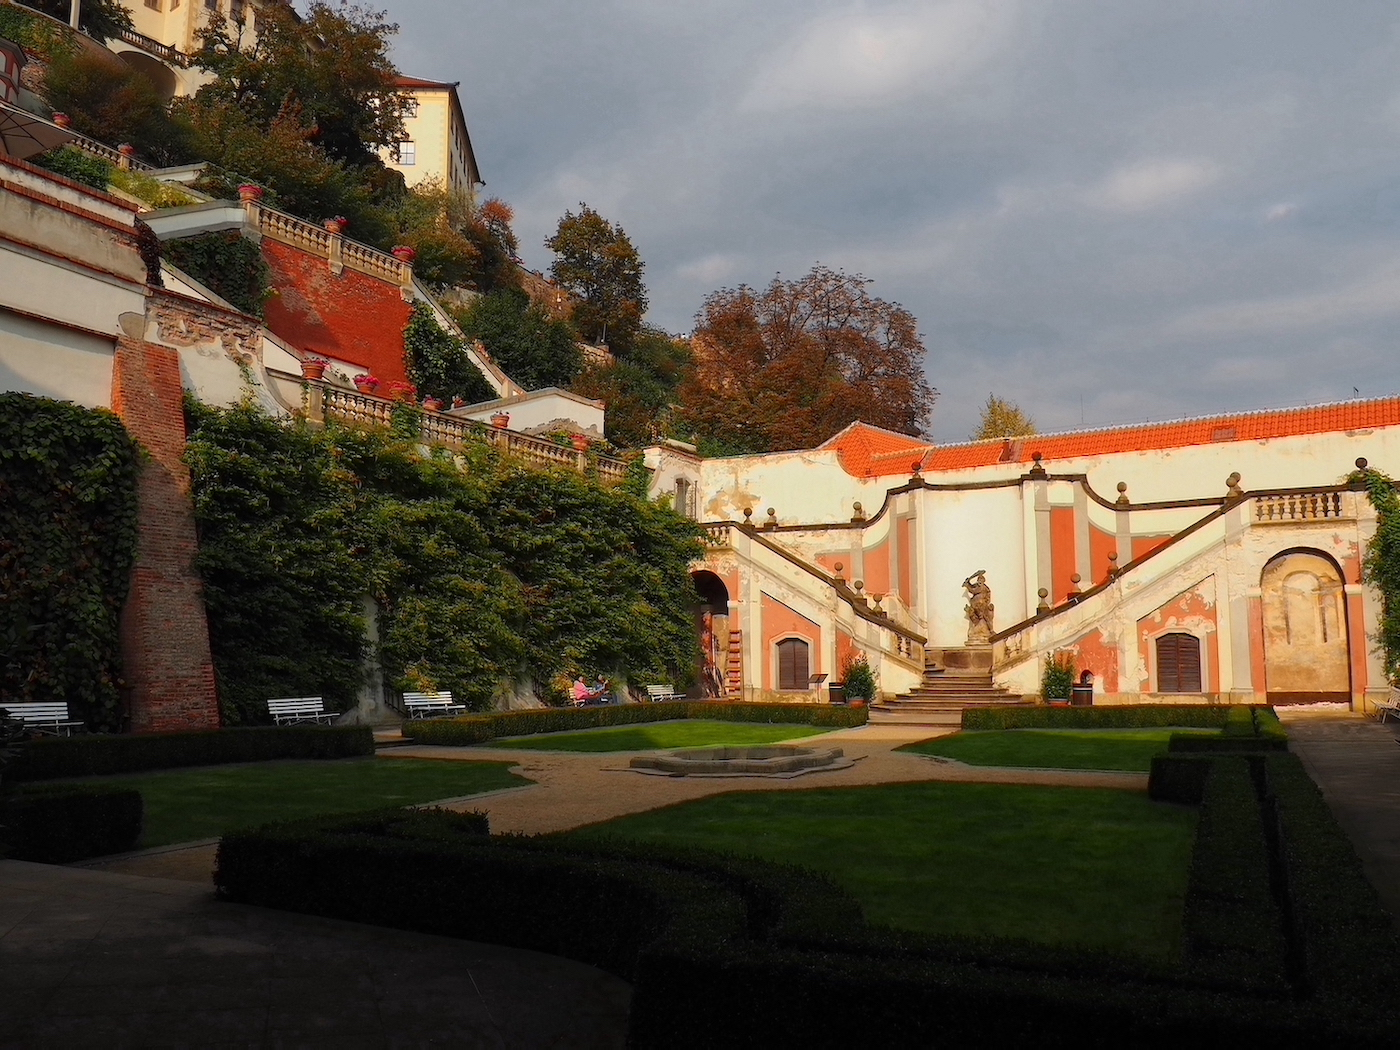 Zahrady pod Pražským hradem – Jardins sous le château de Prague